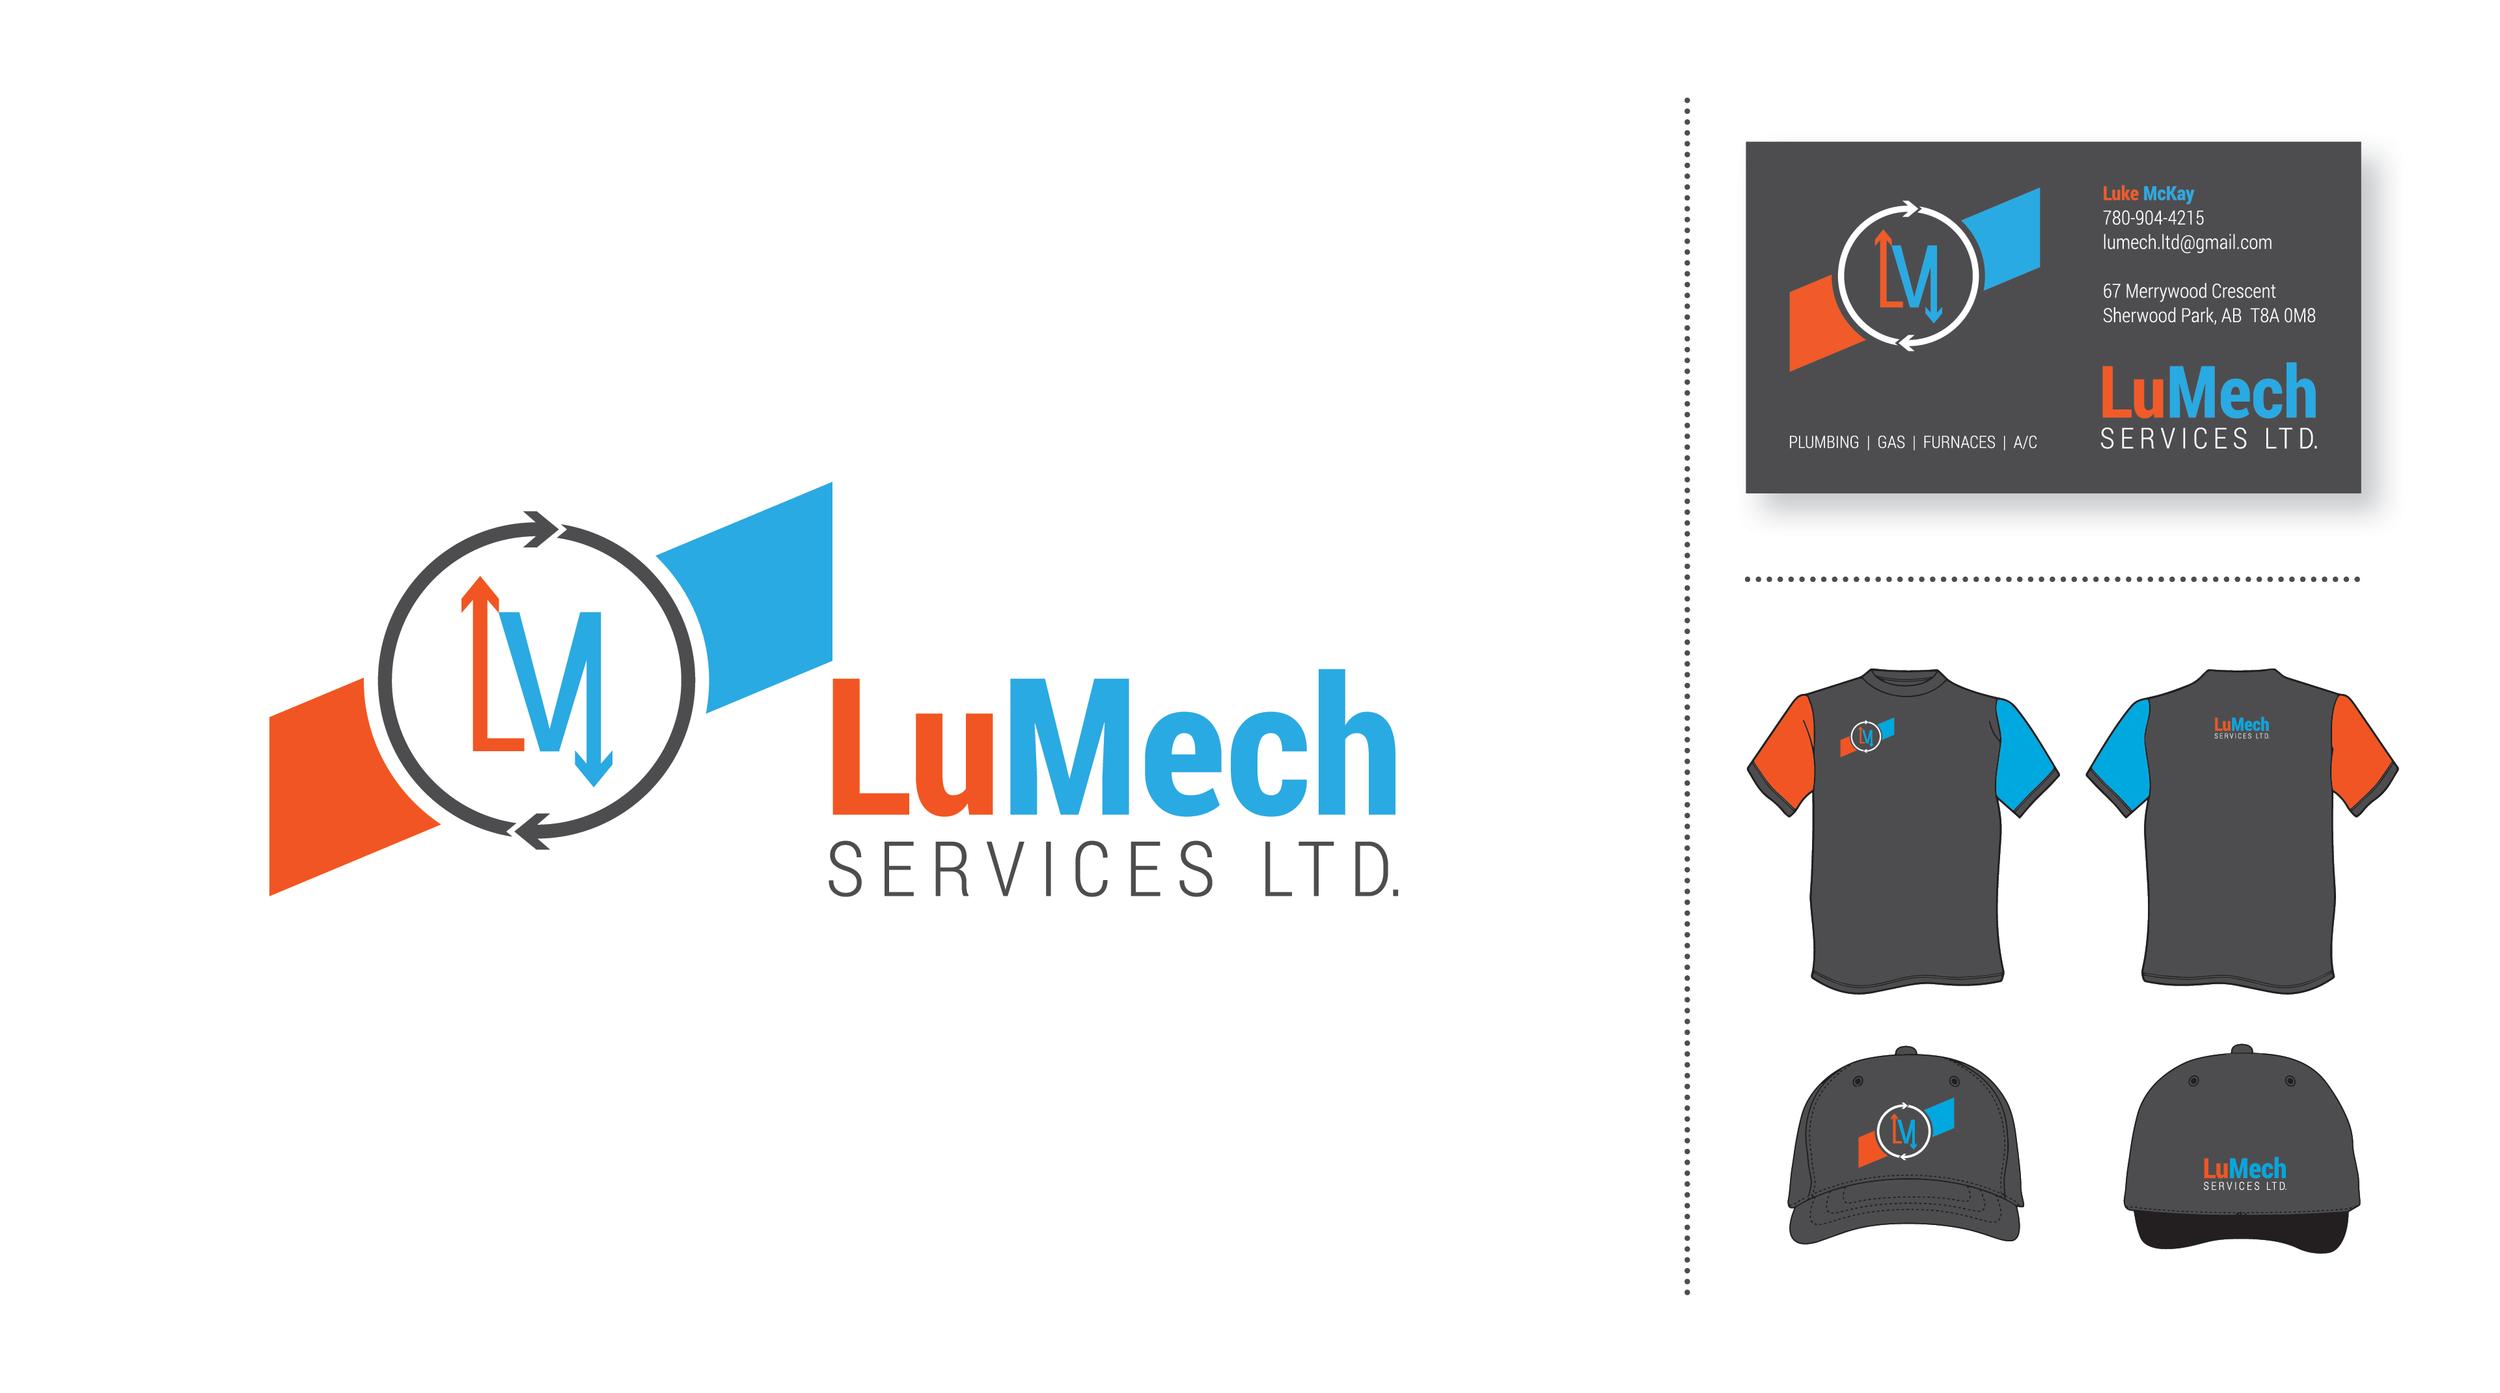 LUMECH SERVICES LTD.